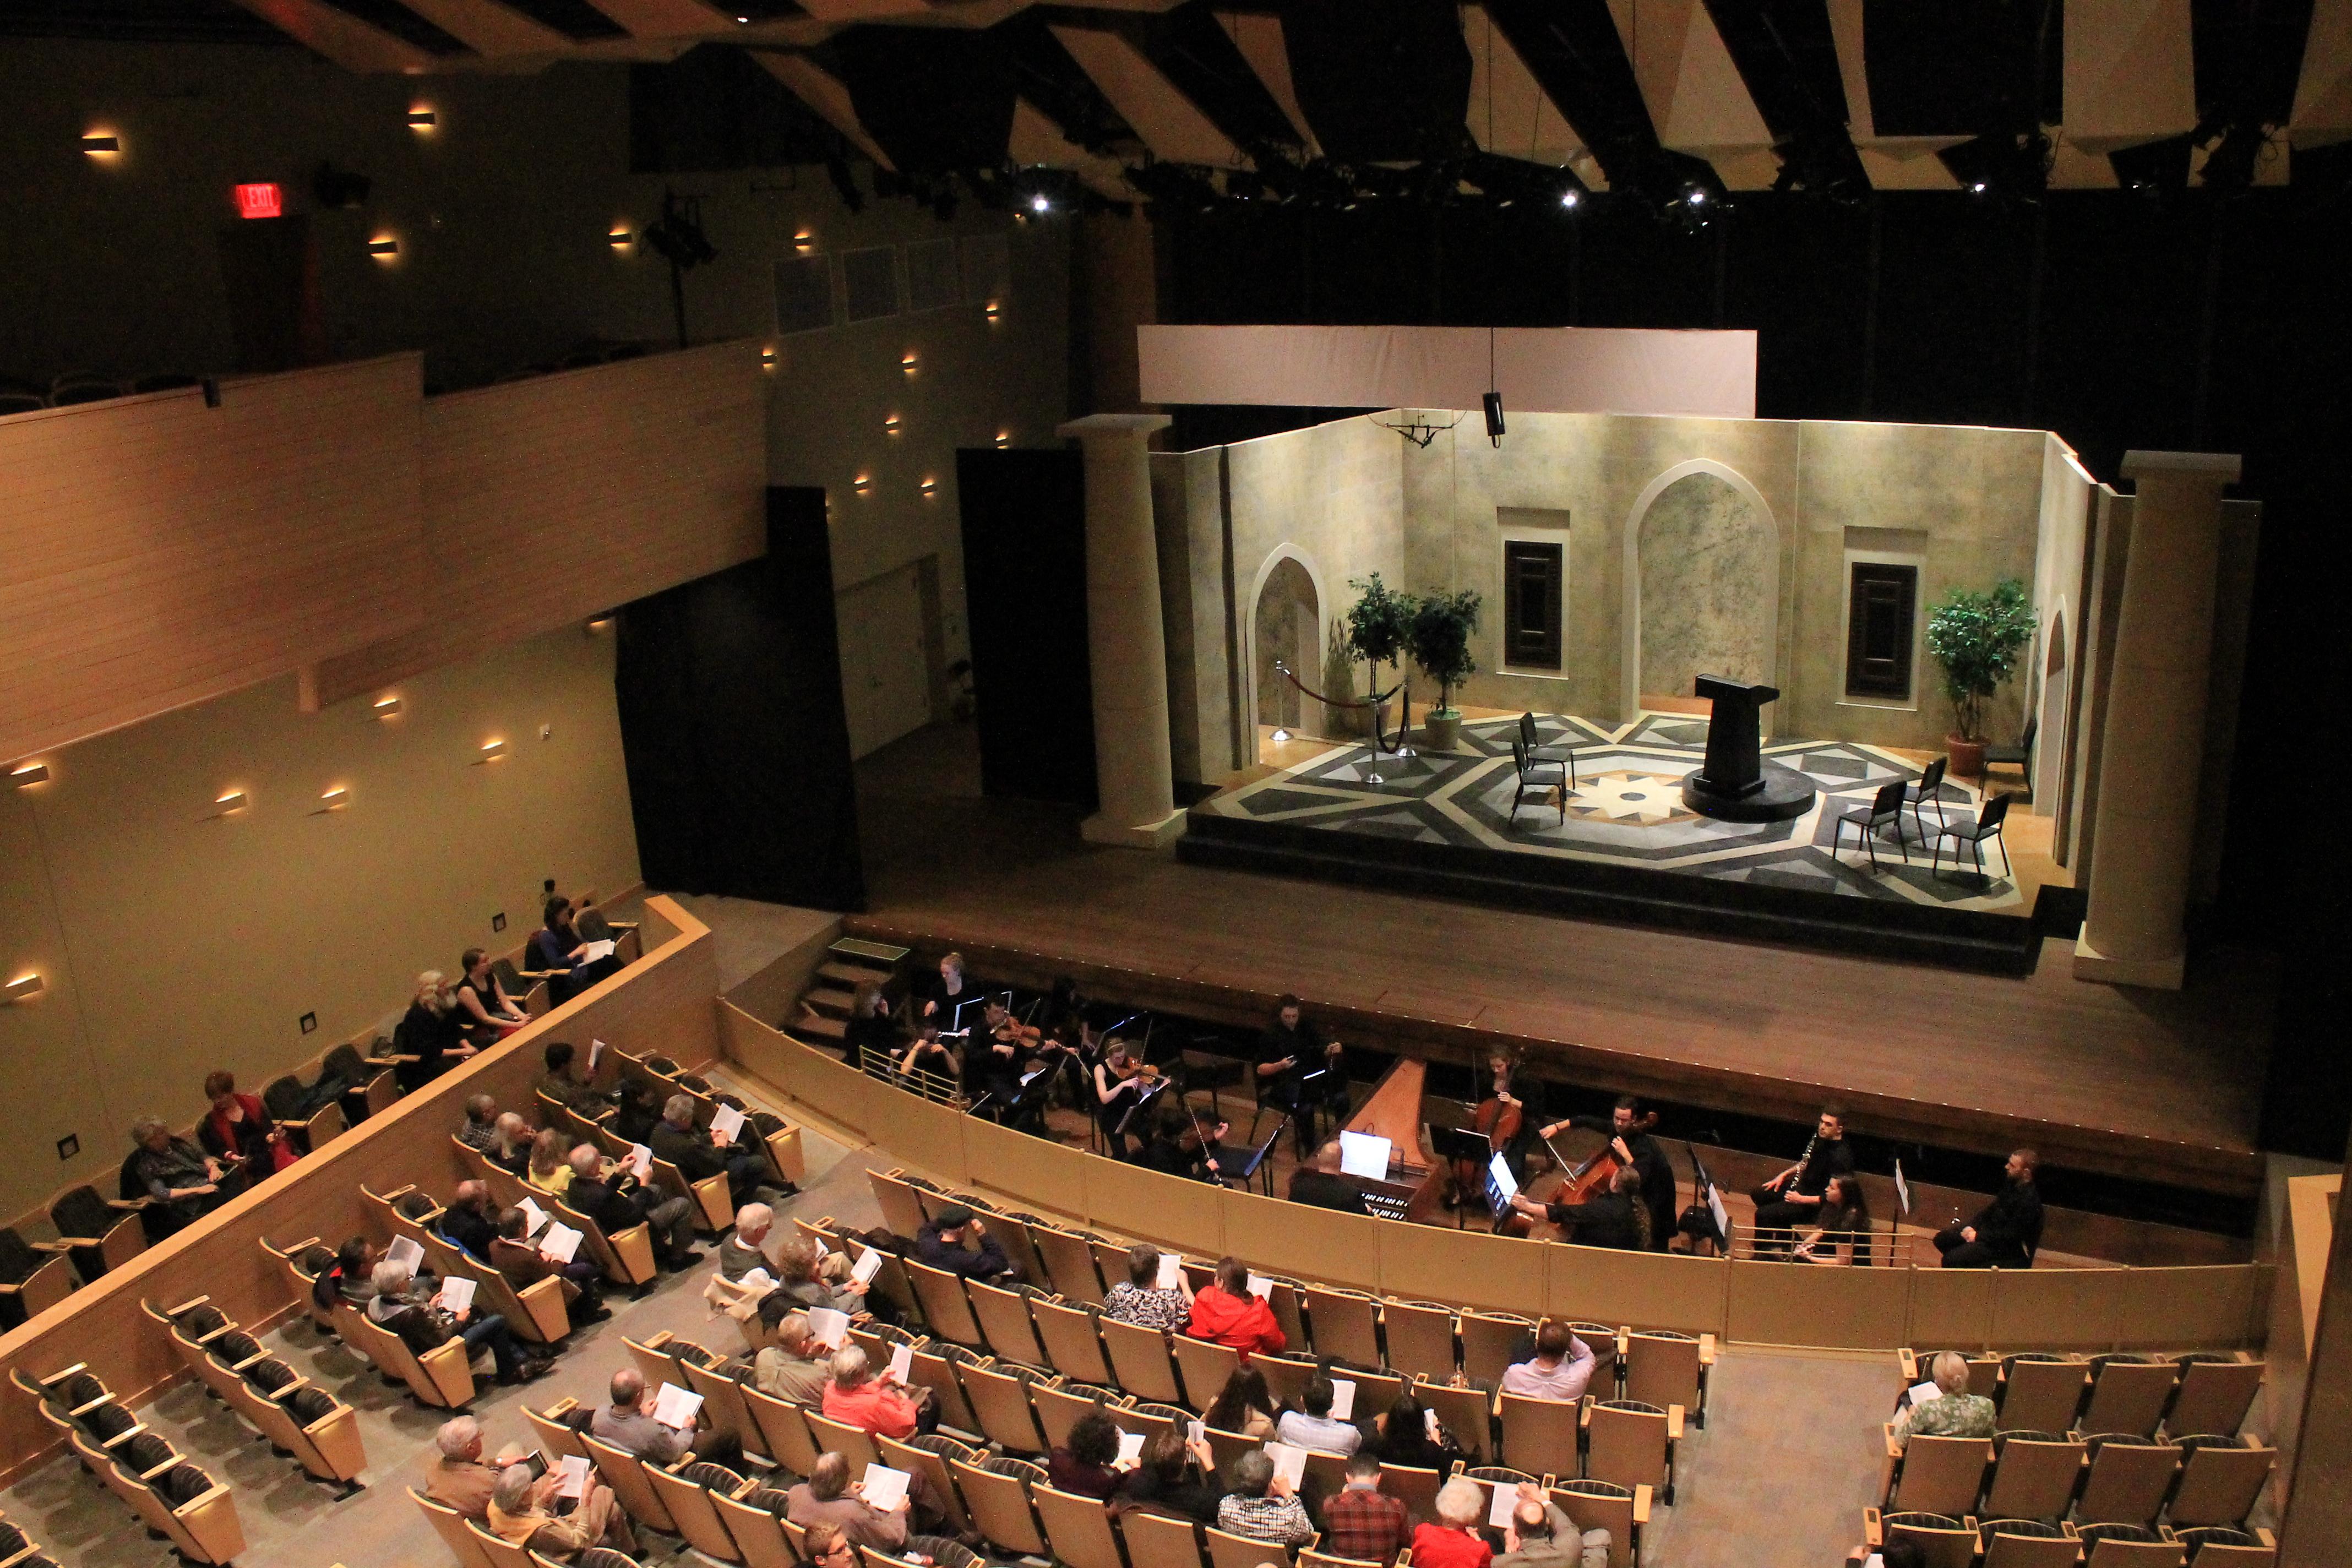 Xerxes, Handel, Skidmore College Opera Workshop, Saratoga Springs, New York, 2016